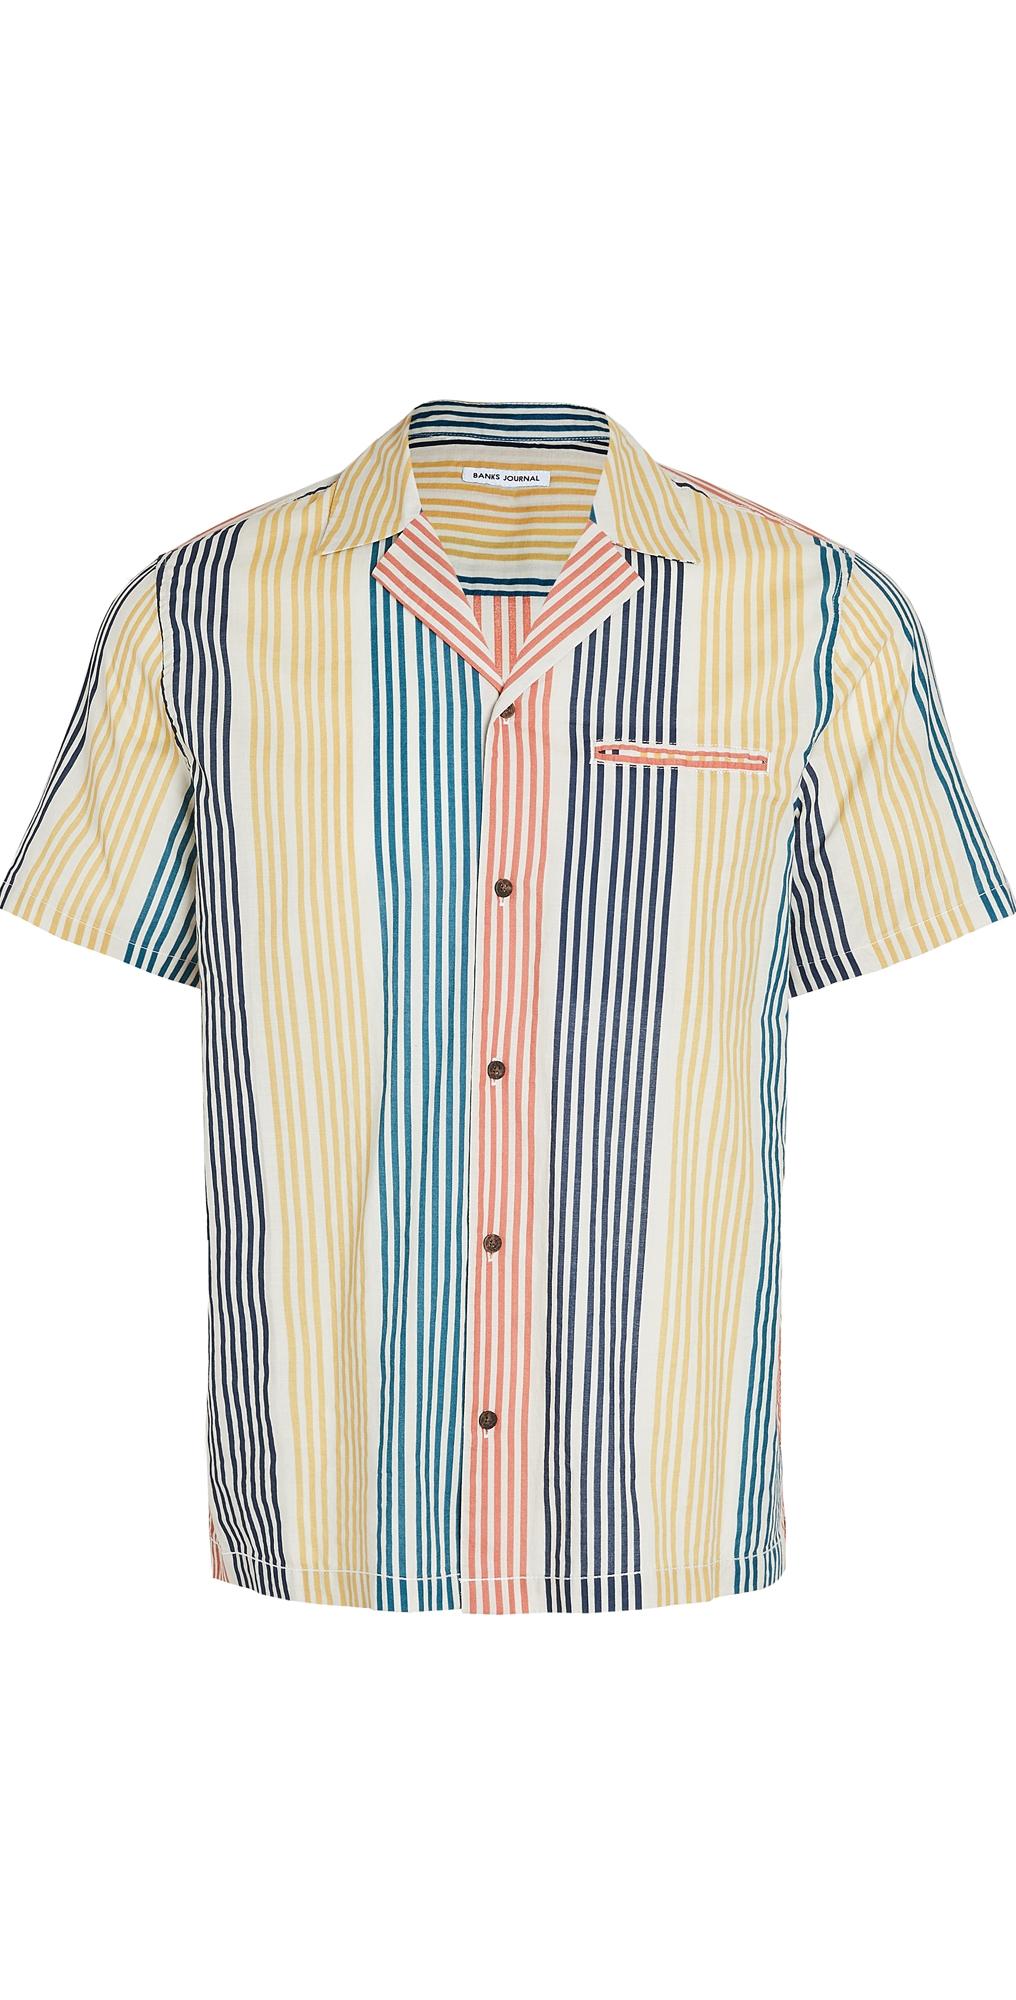 Short Sleeve Multiple Woven Shirt